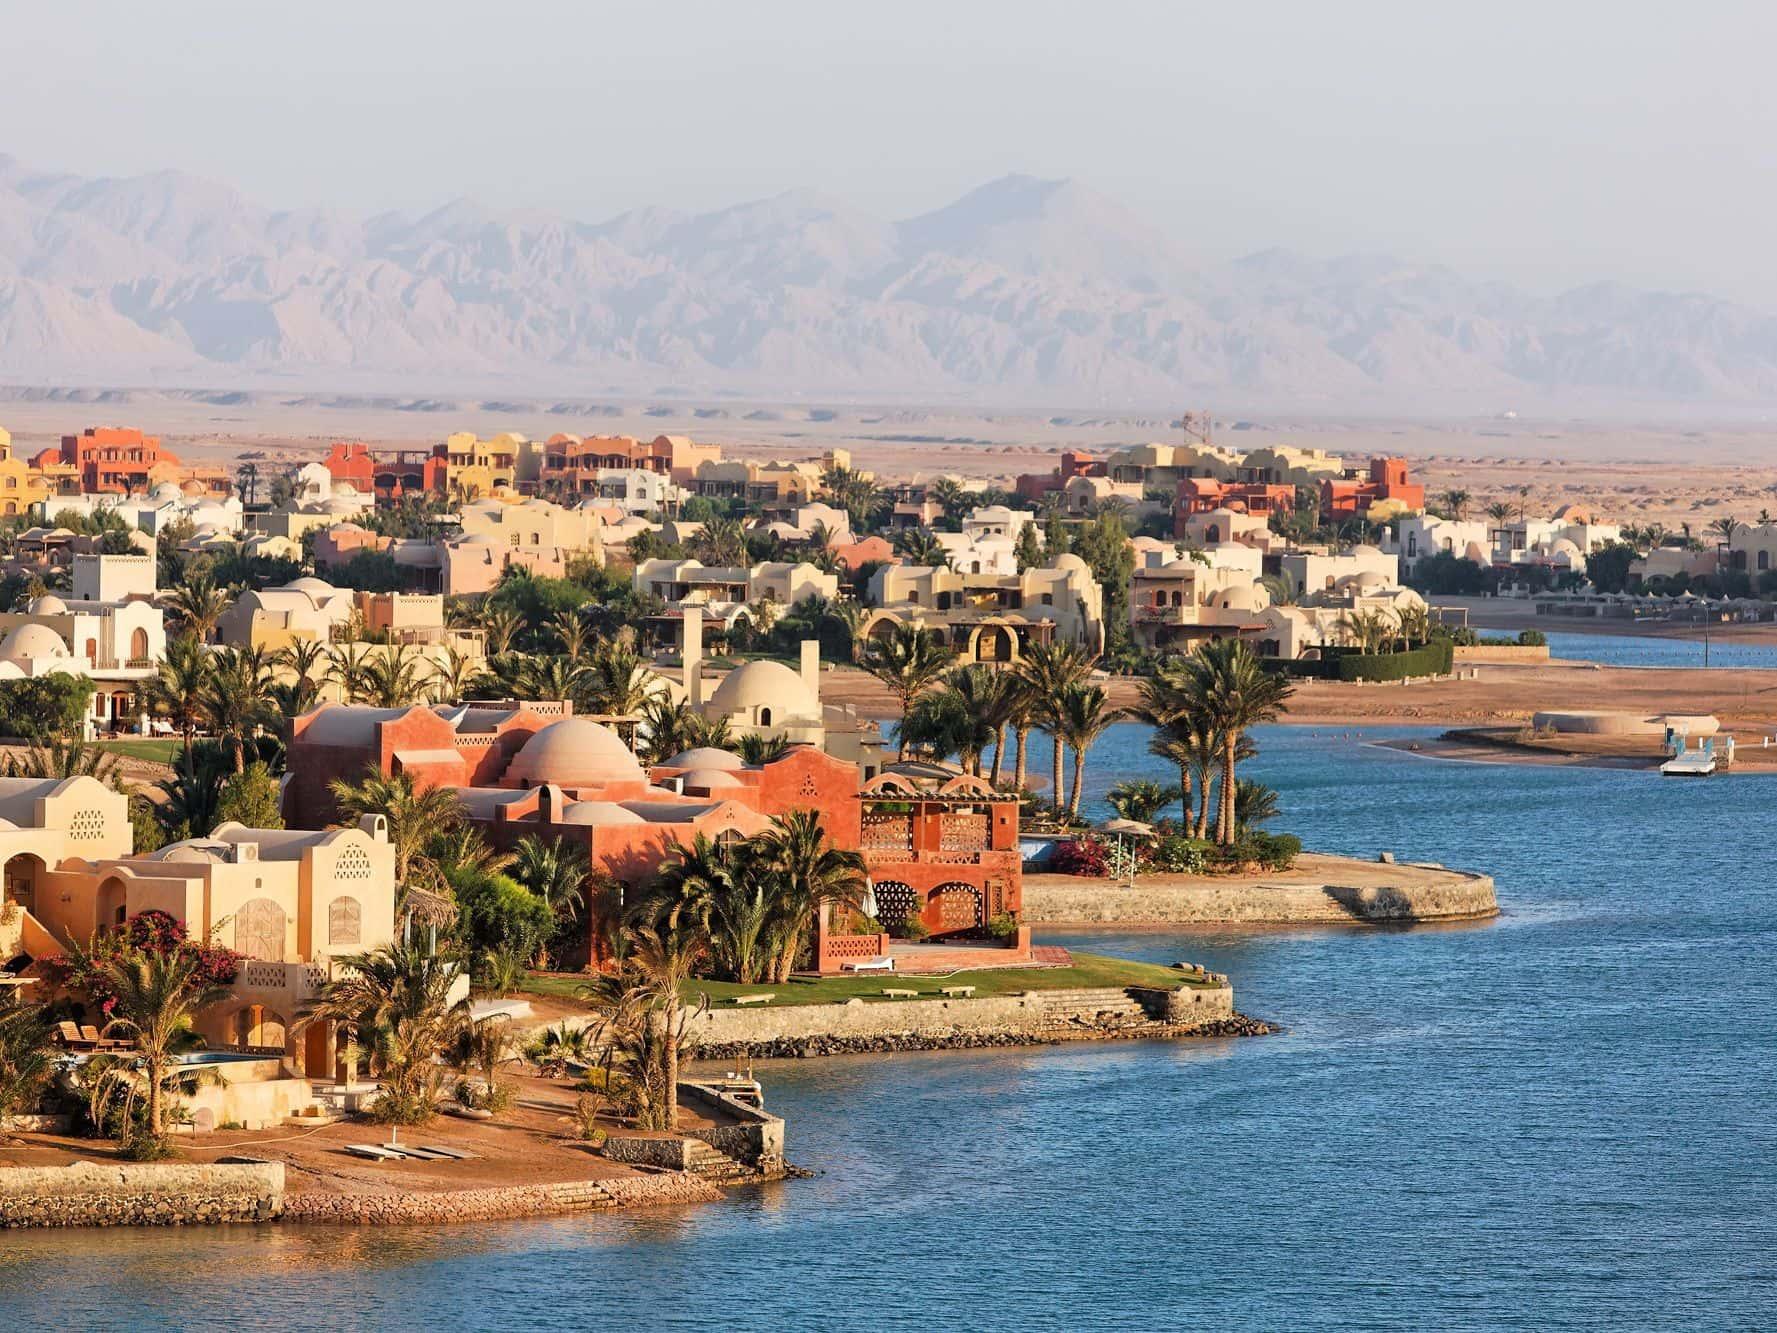 Эль-Гуна, Египет